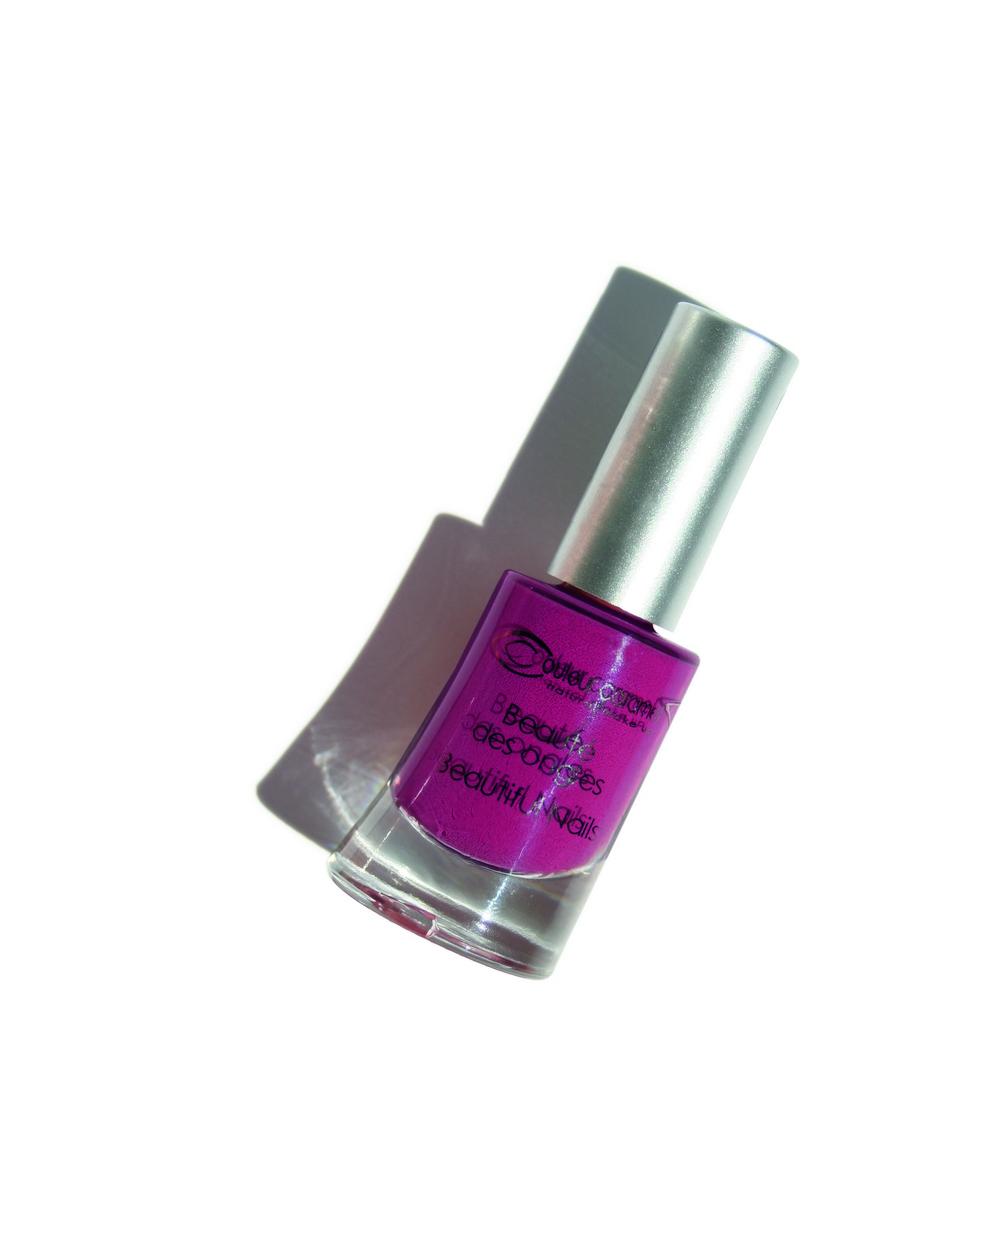 Venis a ongles rose zinia couleur caramel 118841 embellissetvous fr